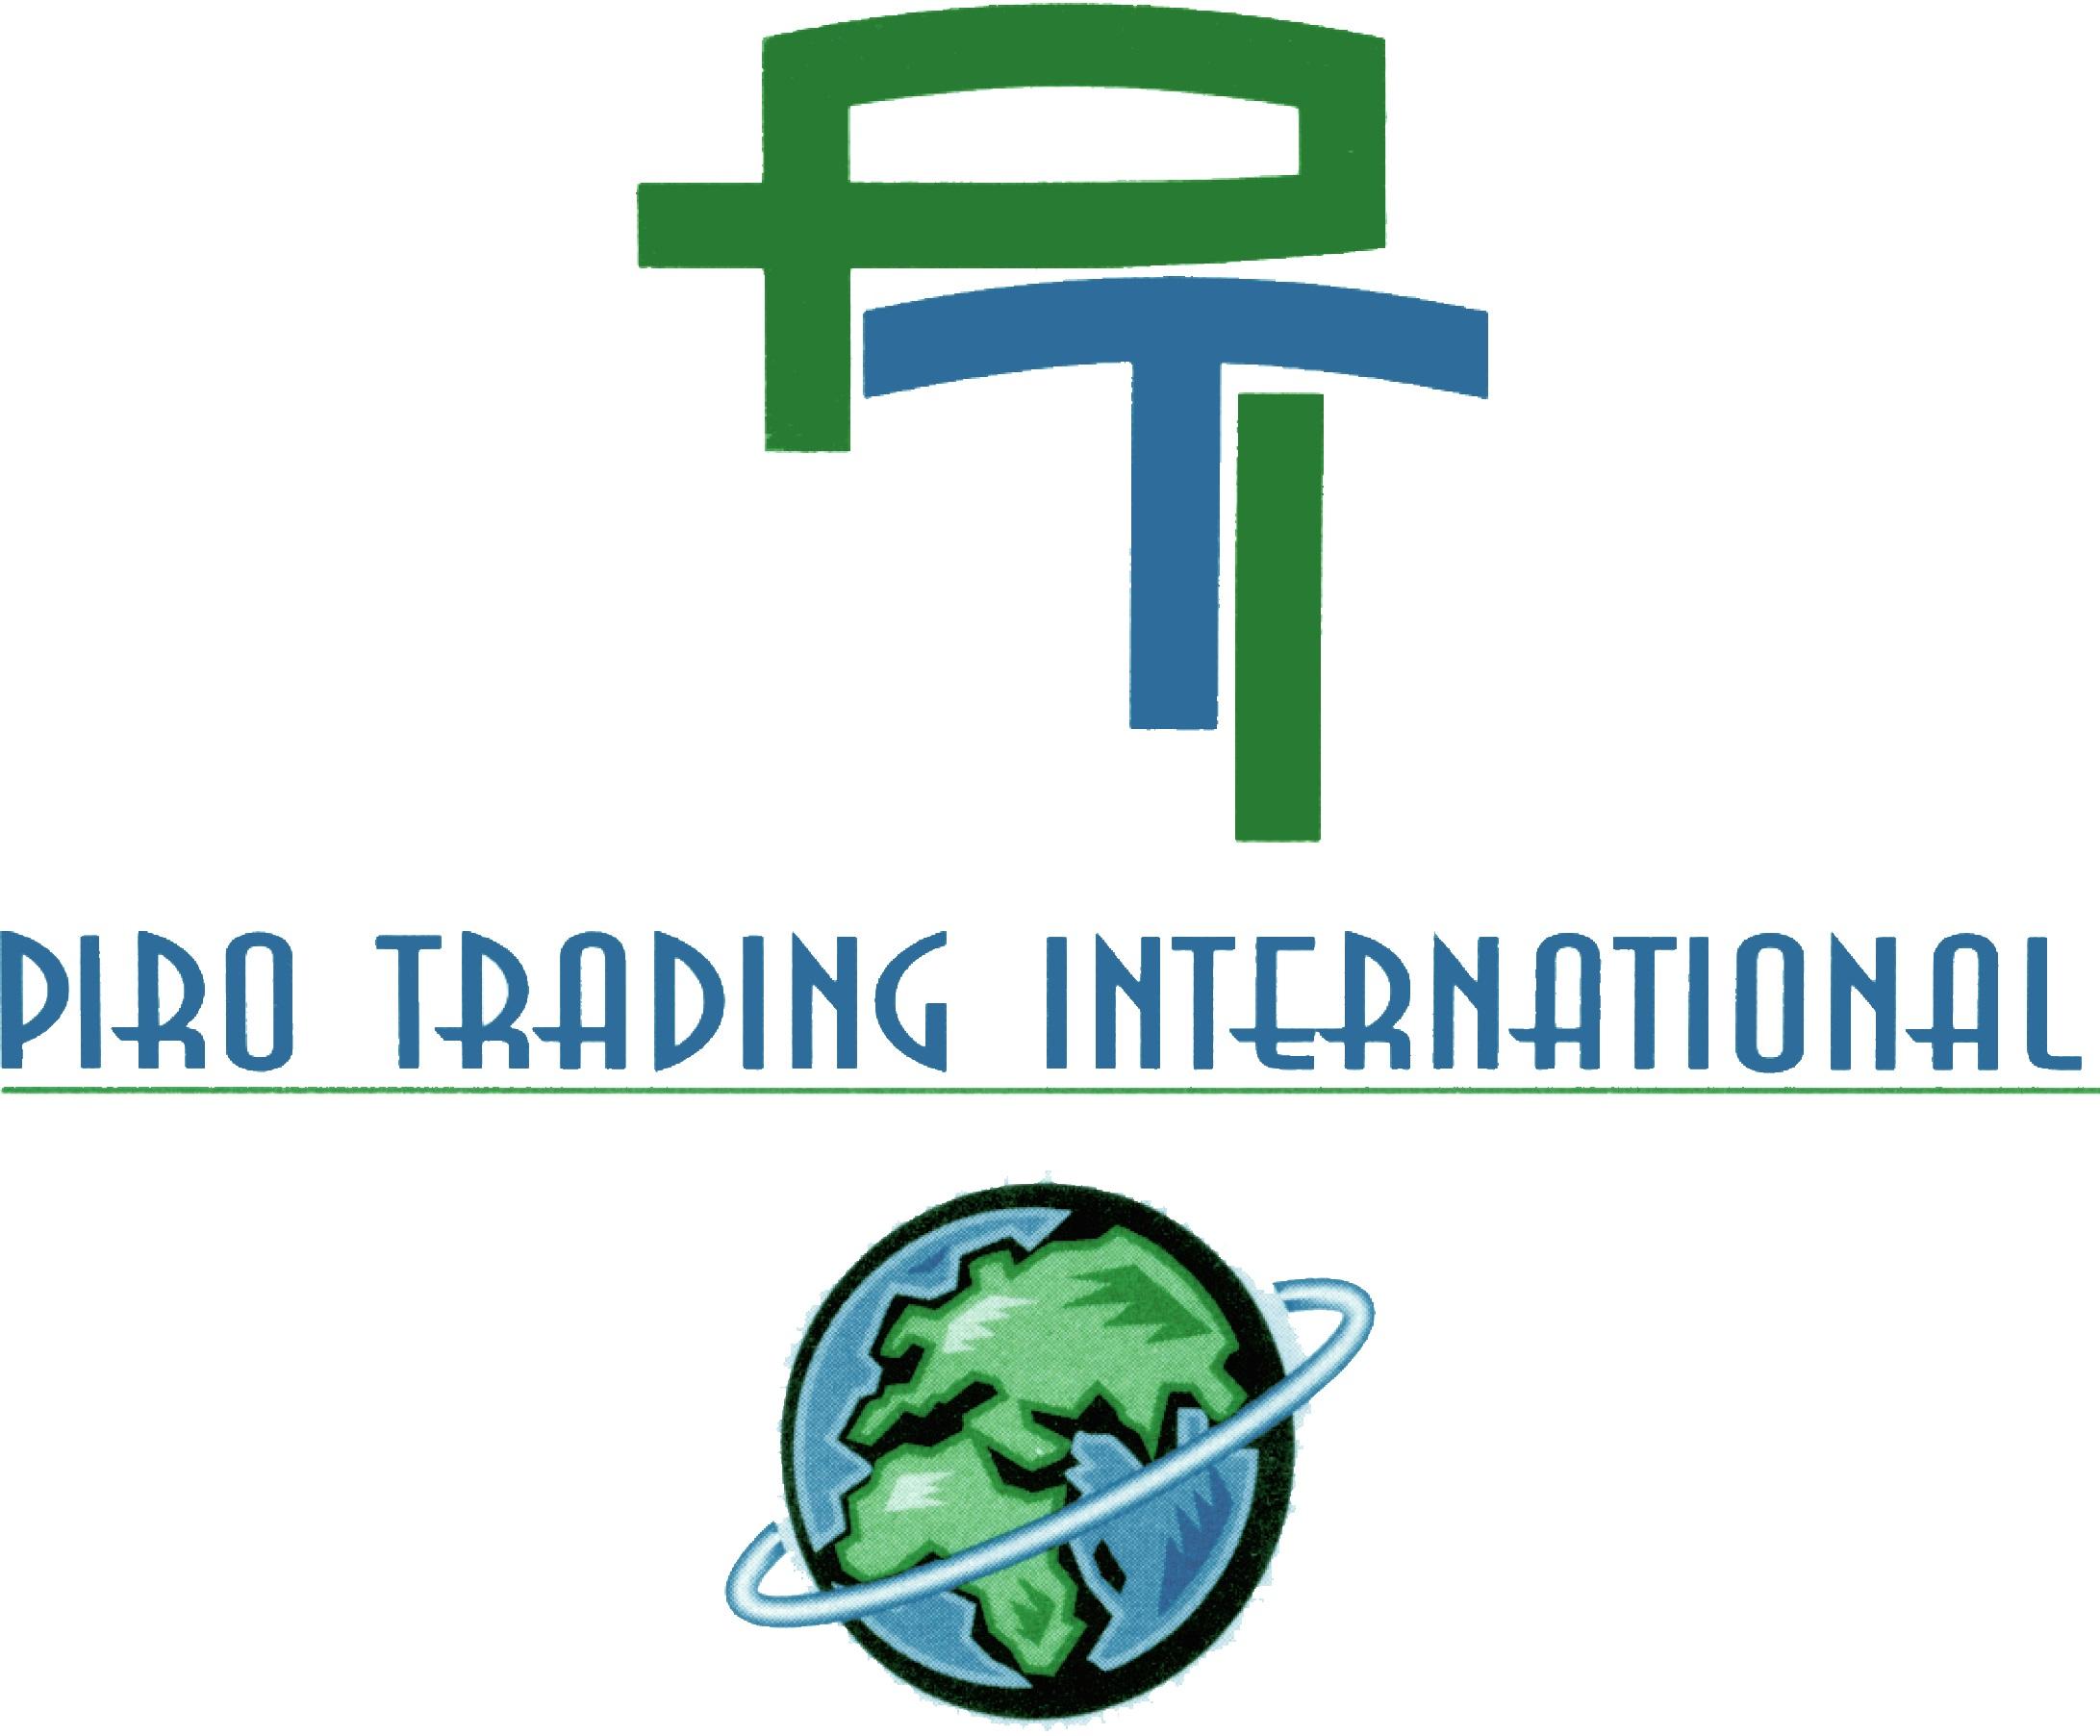 PIRO TRADING INTERNATIONAL